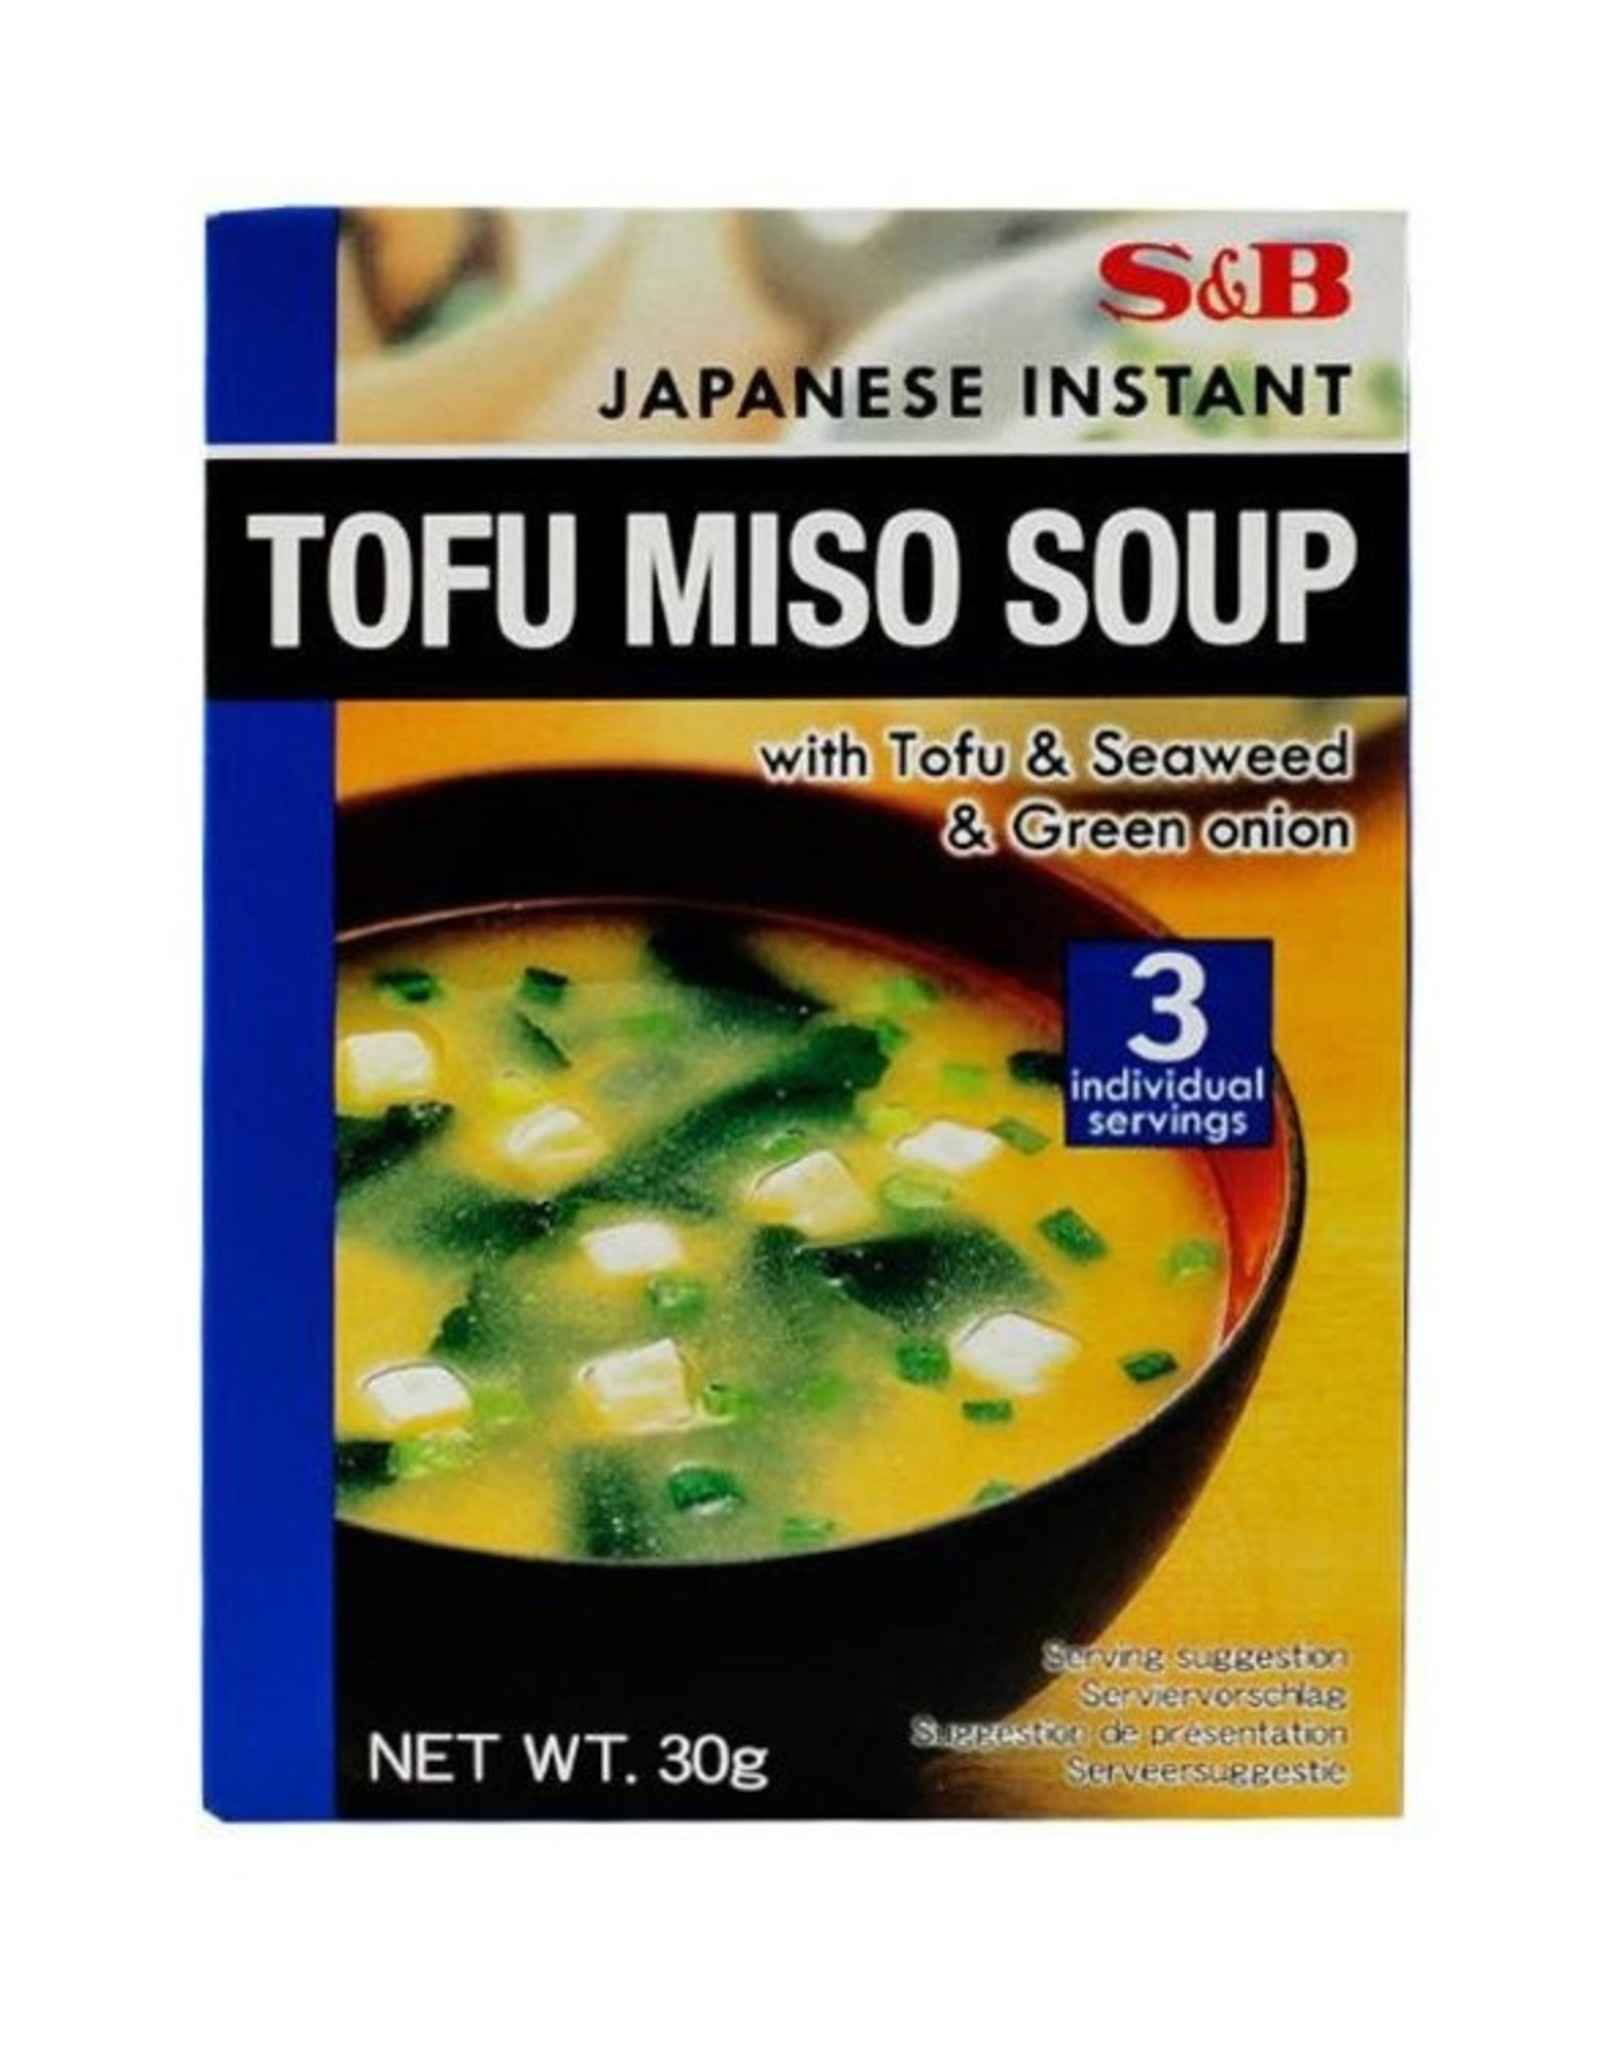 S&B Instant tofu miso soup S&B 30g